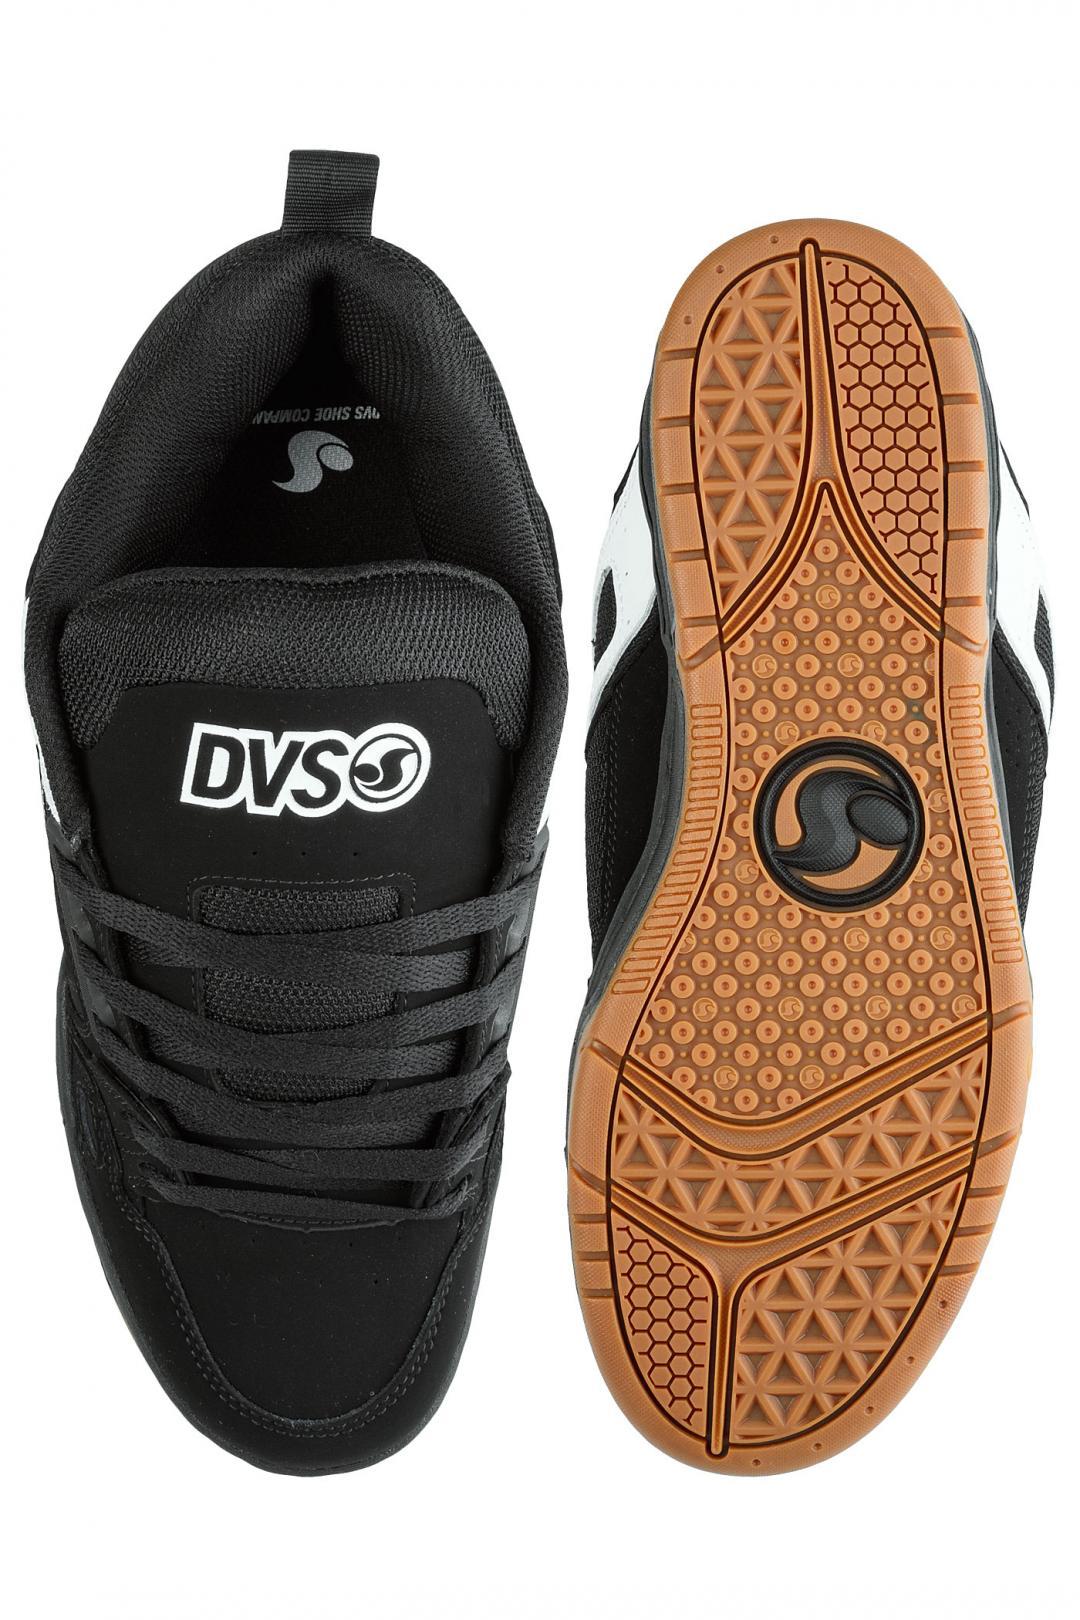 Uomo DVS Comanche black white nubuck | Sneakers low top